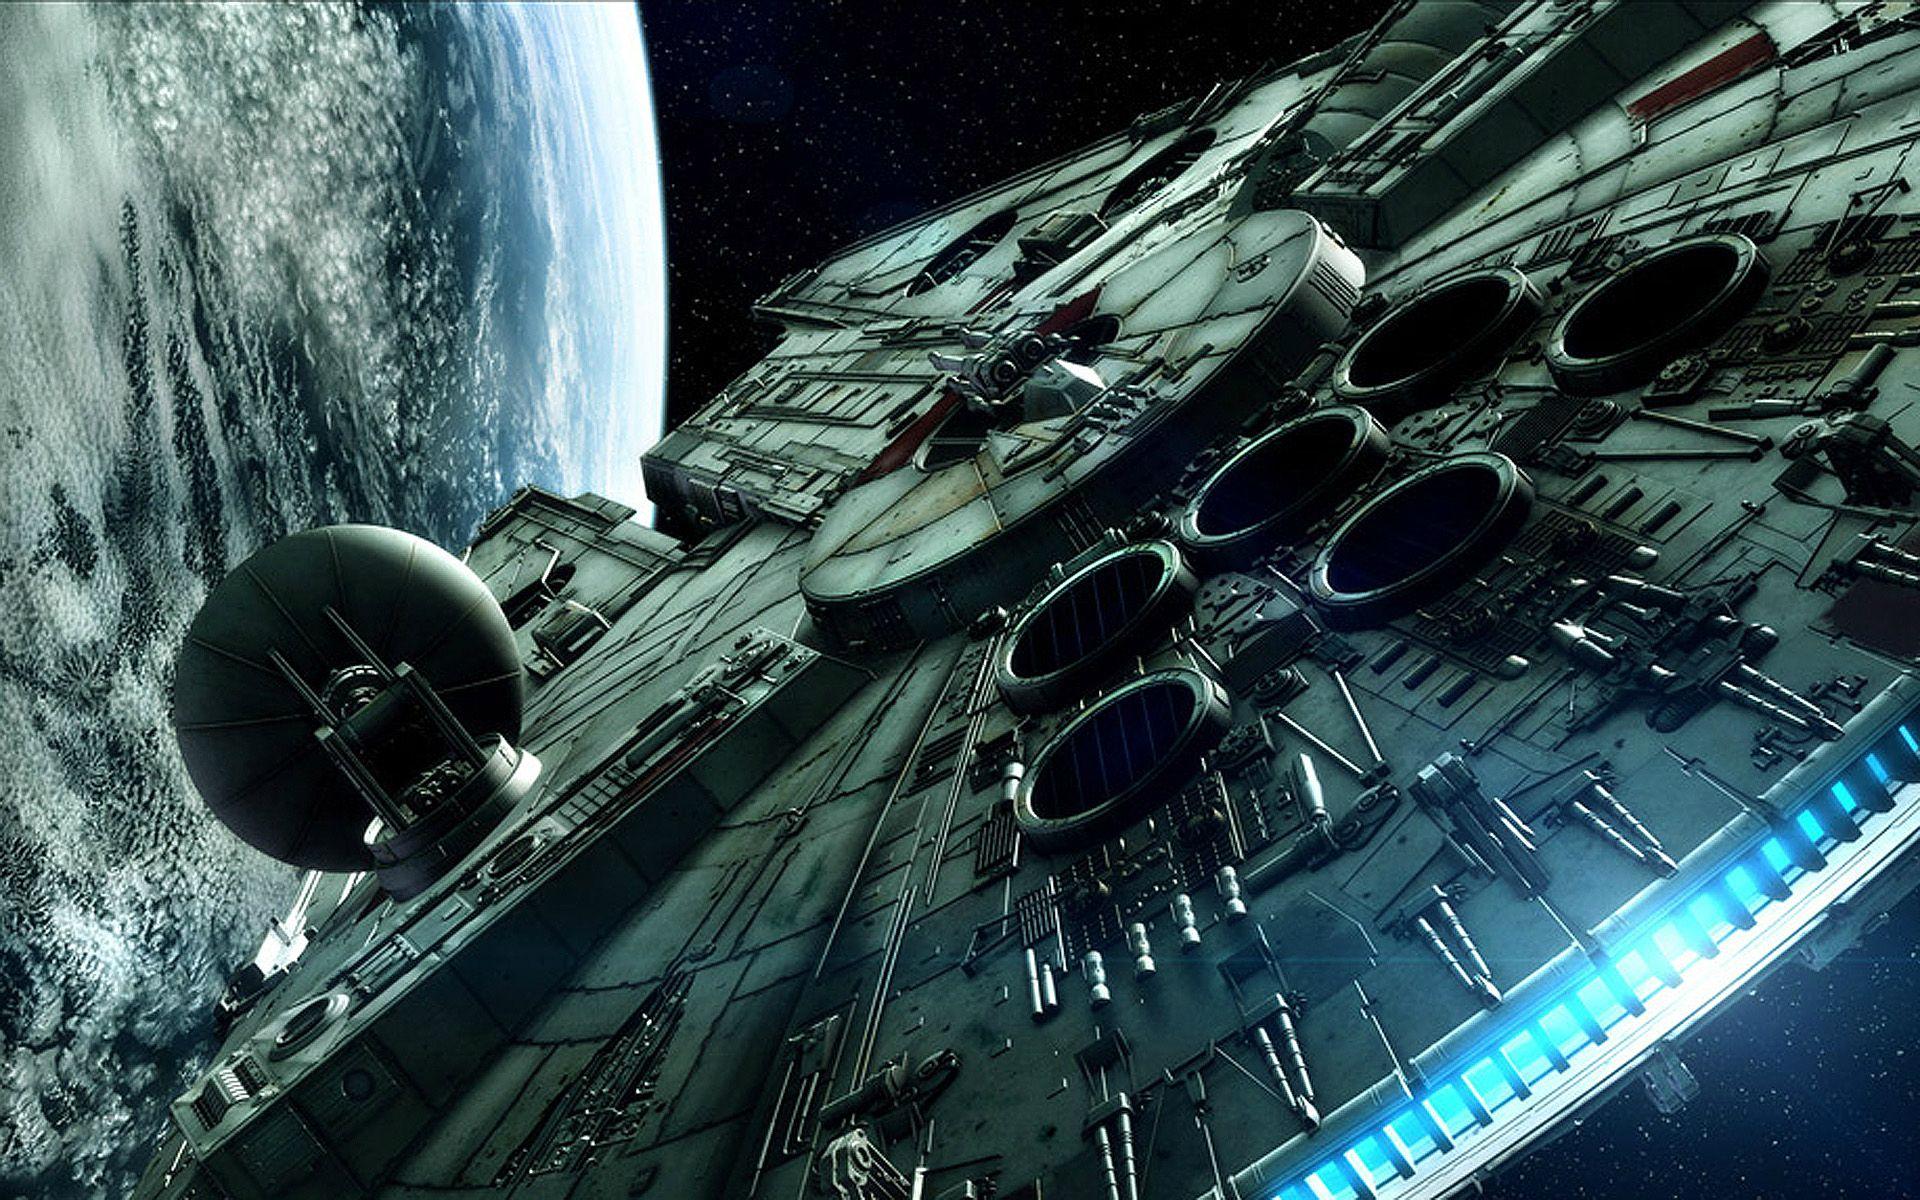 General 1920x1200 Star Wars Millennium Falcon spaceship planet space vehicle space art movies CGI render digital art science fiction Star Wars Ships